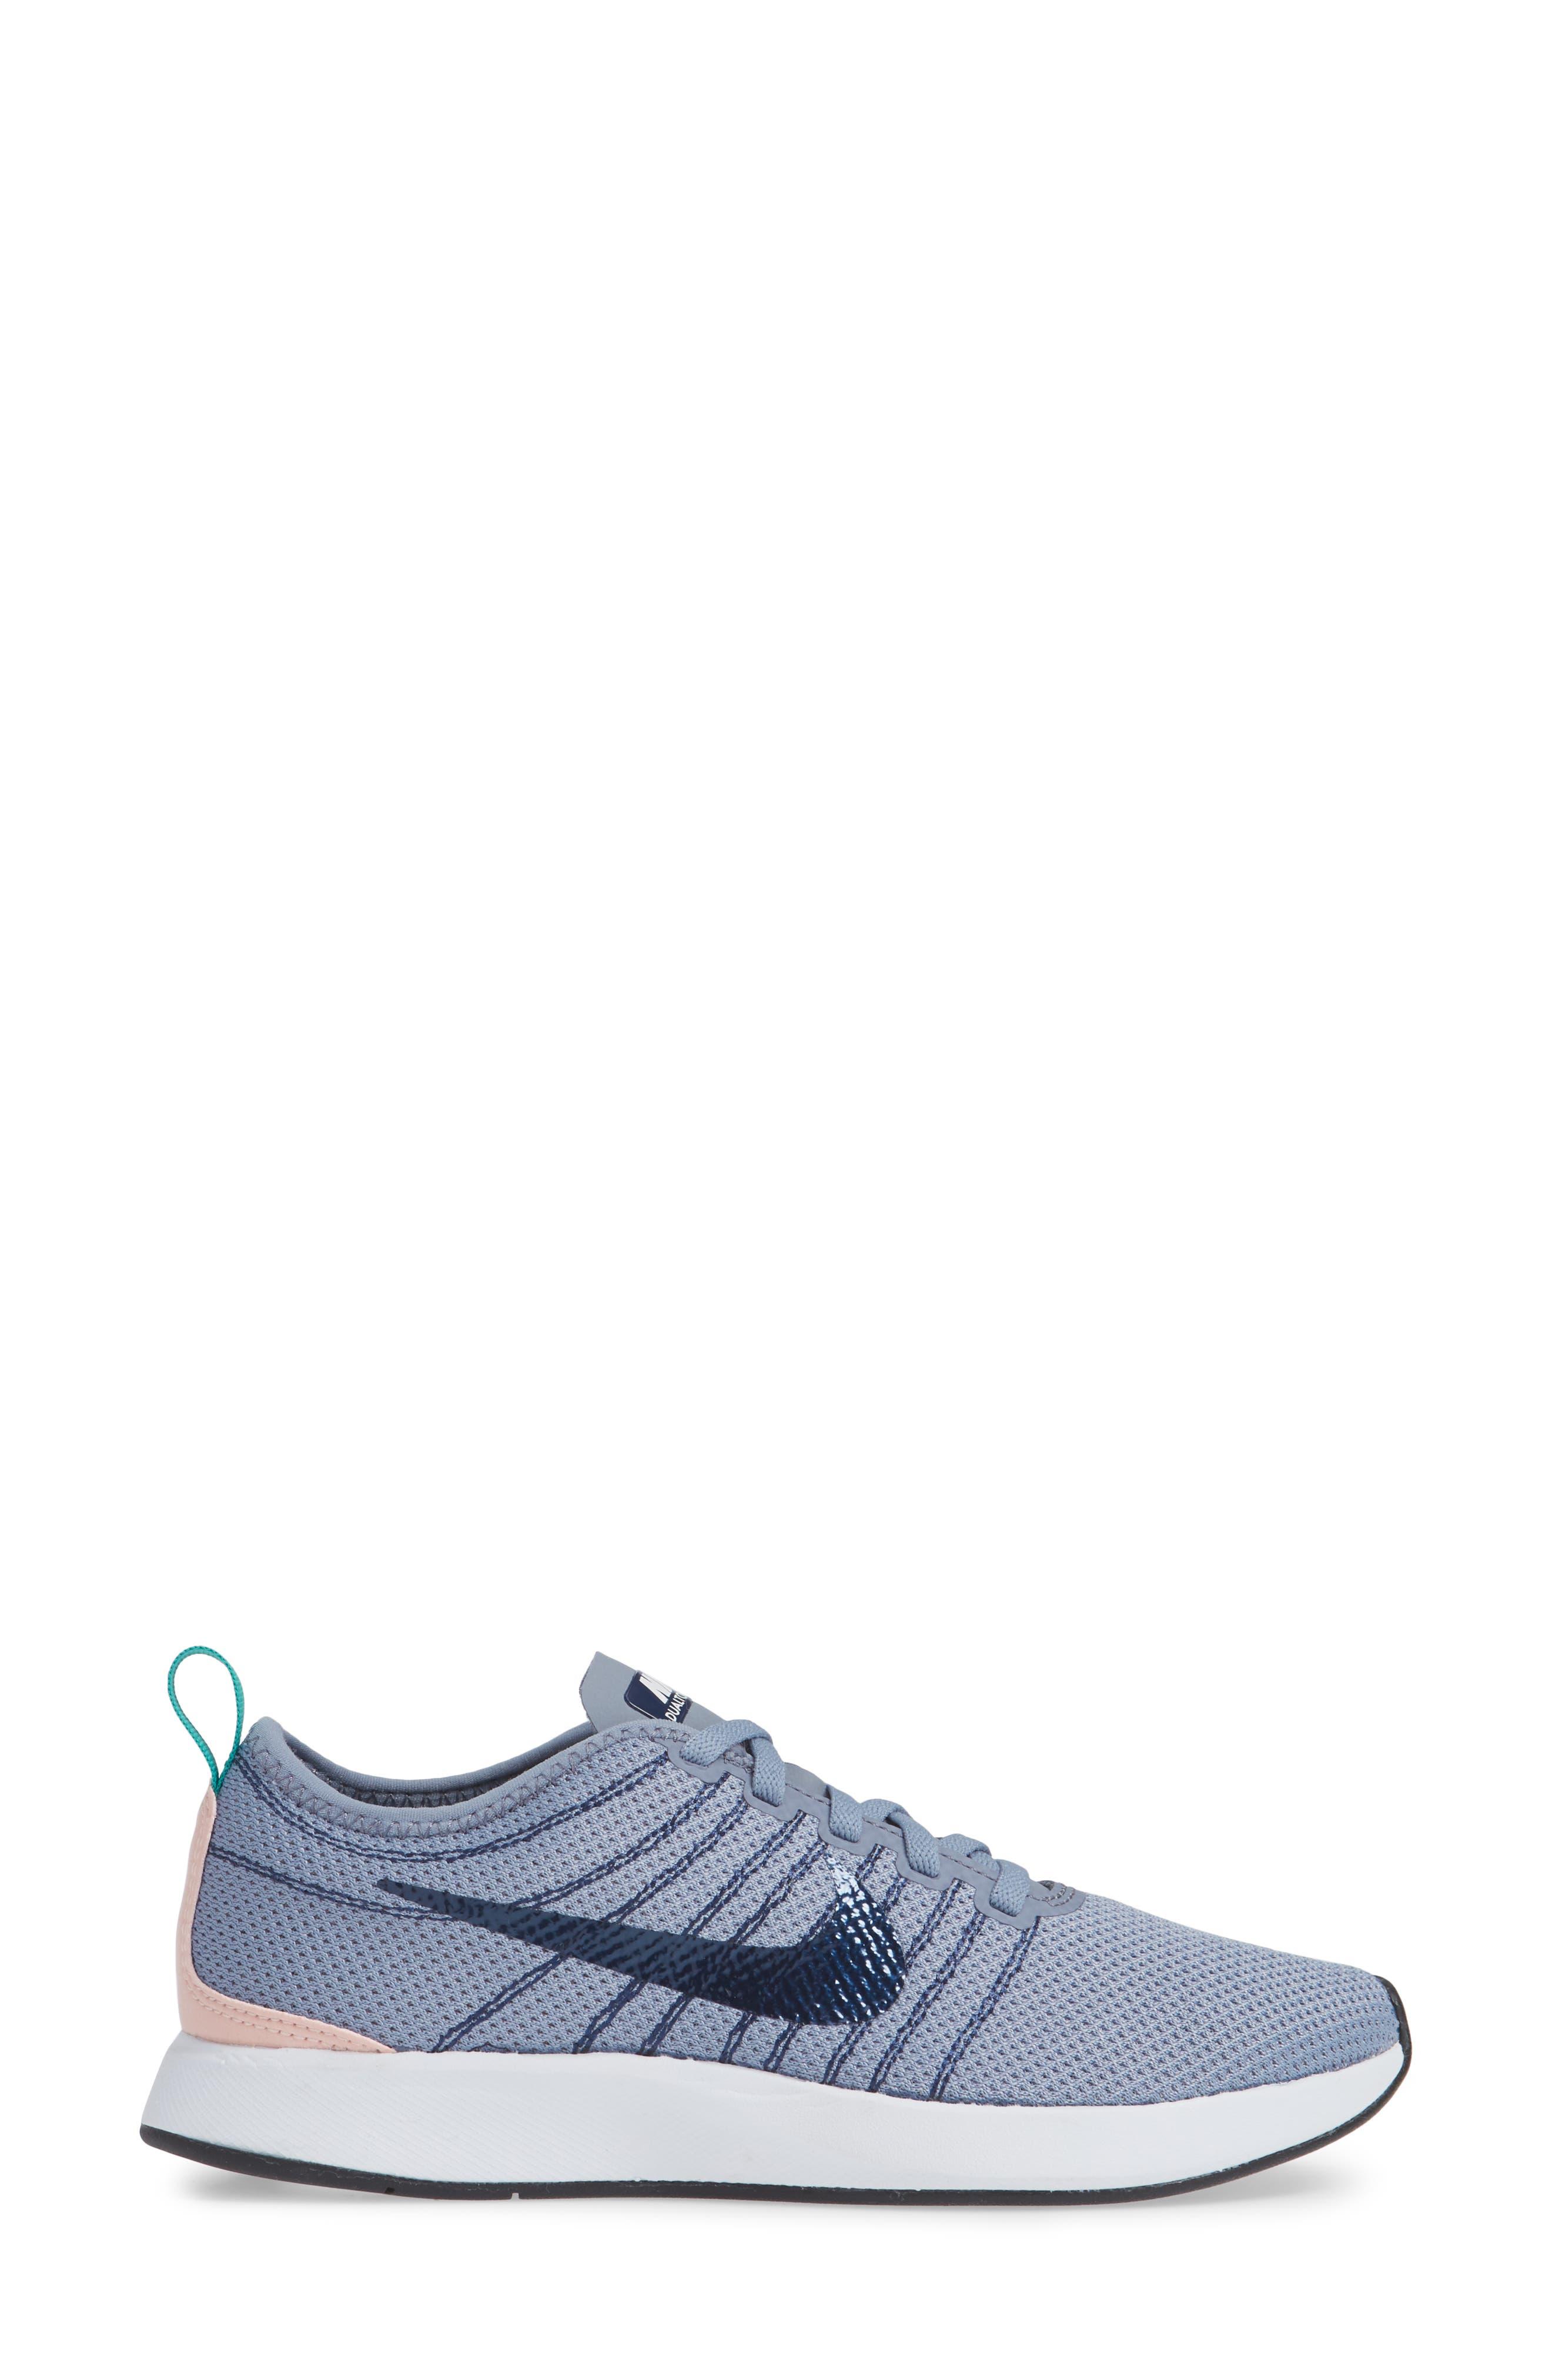 Dualtone Racer Running Shoe,                             Alternate thumbnail 3, color,                             ASHEN SLATE/ NAVY/ STORM PINK